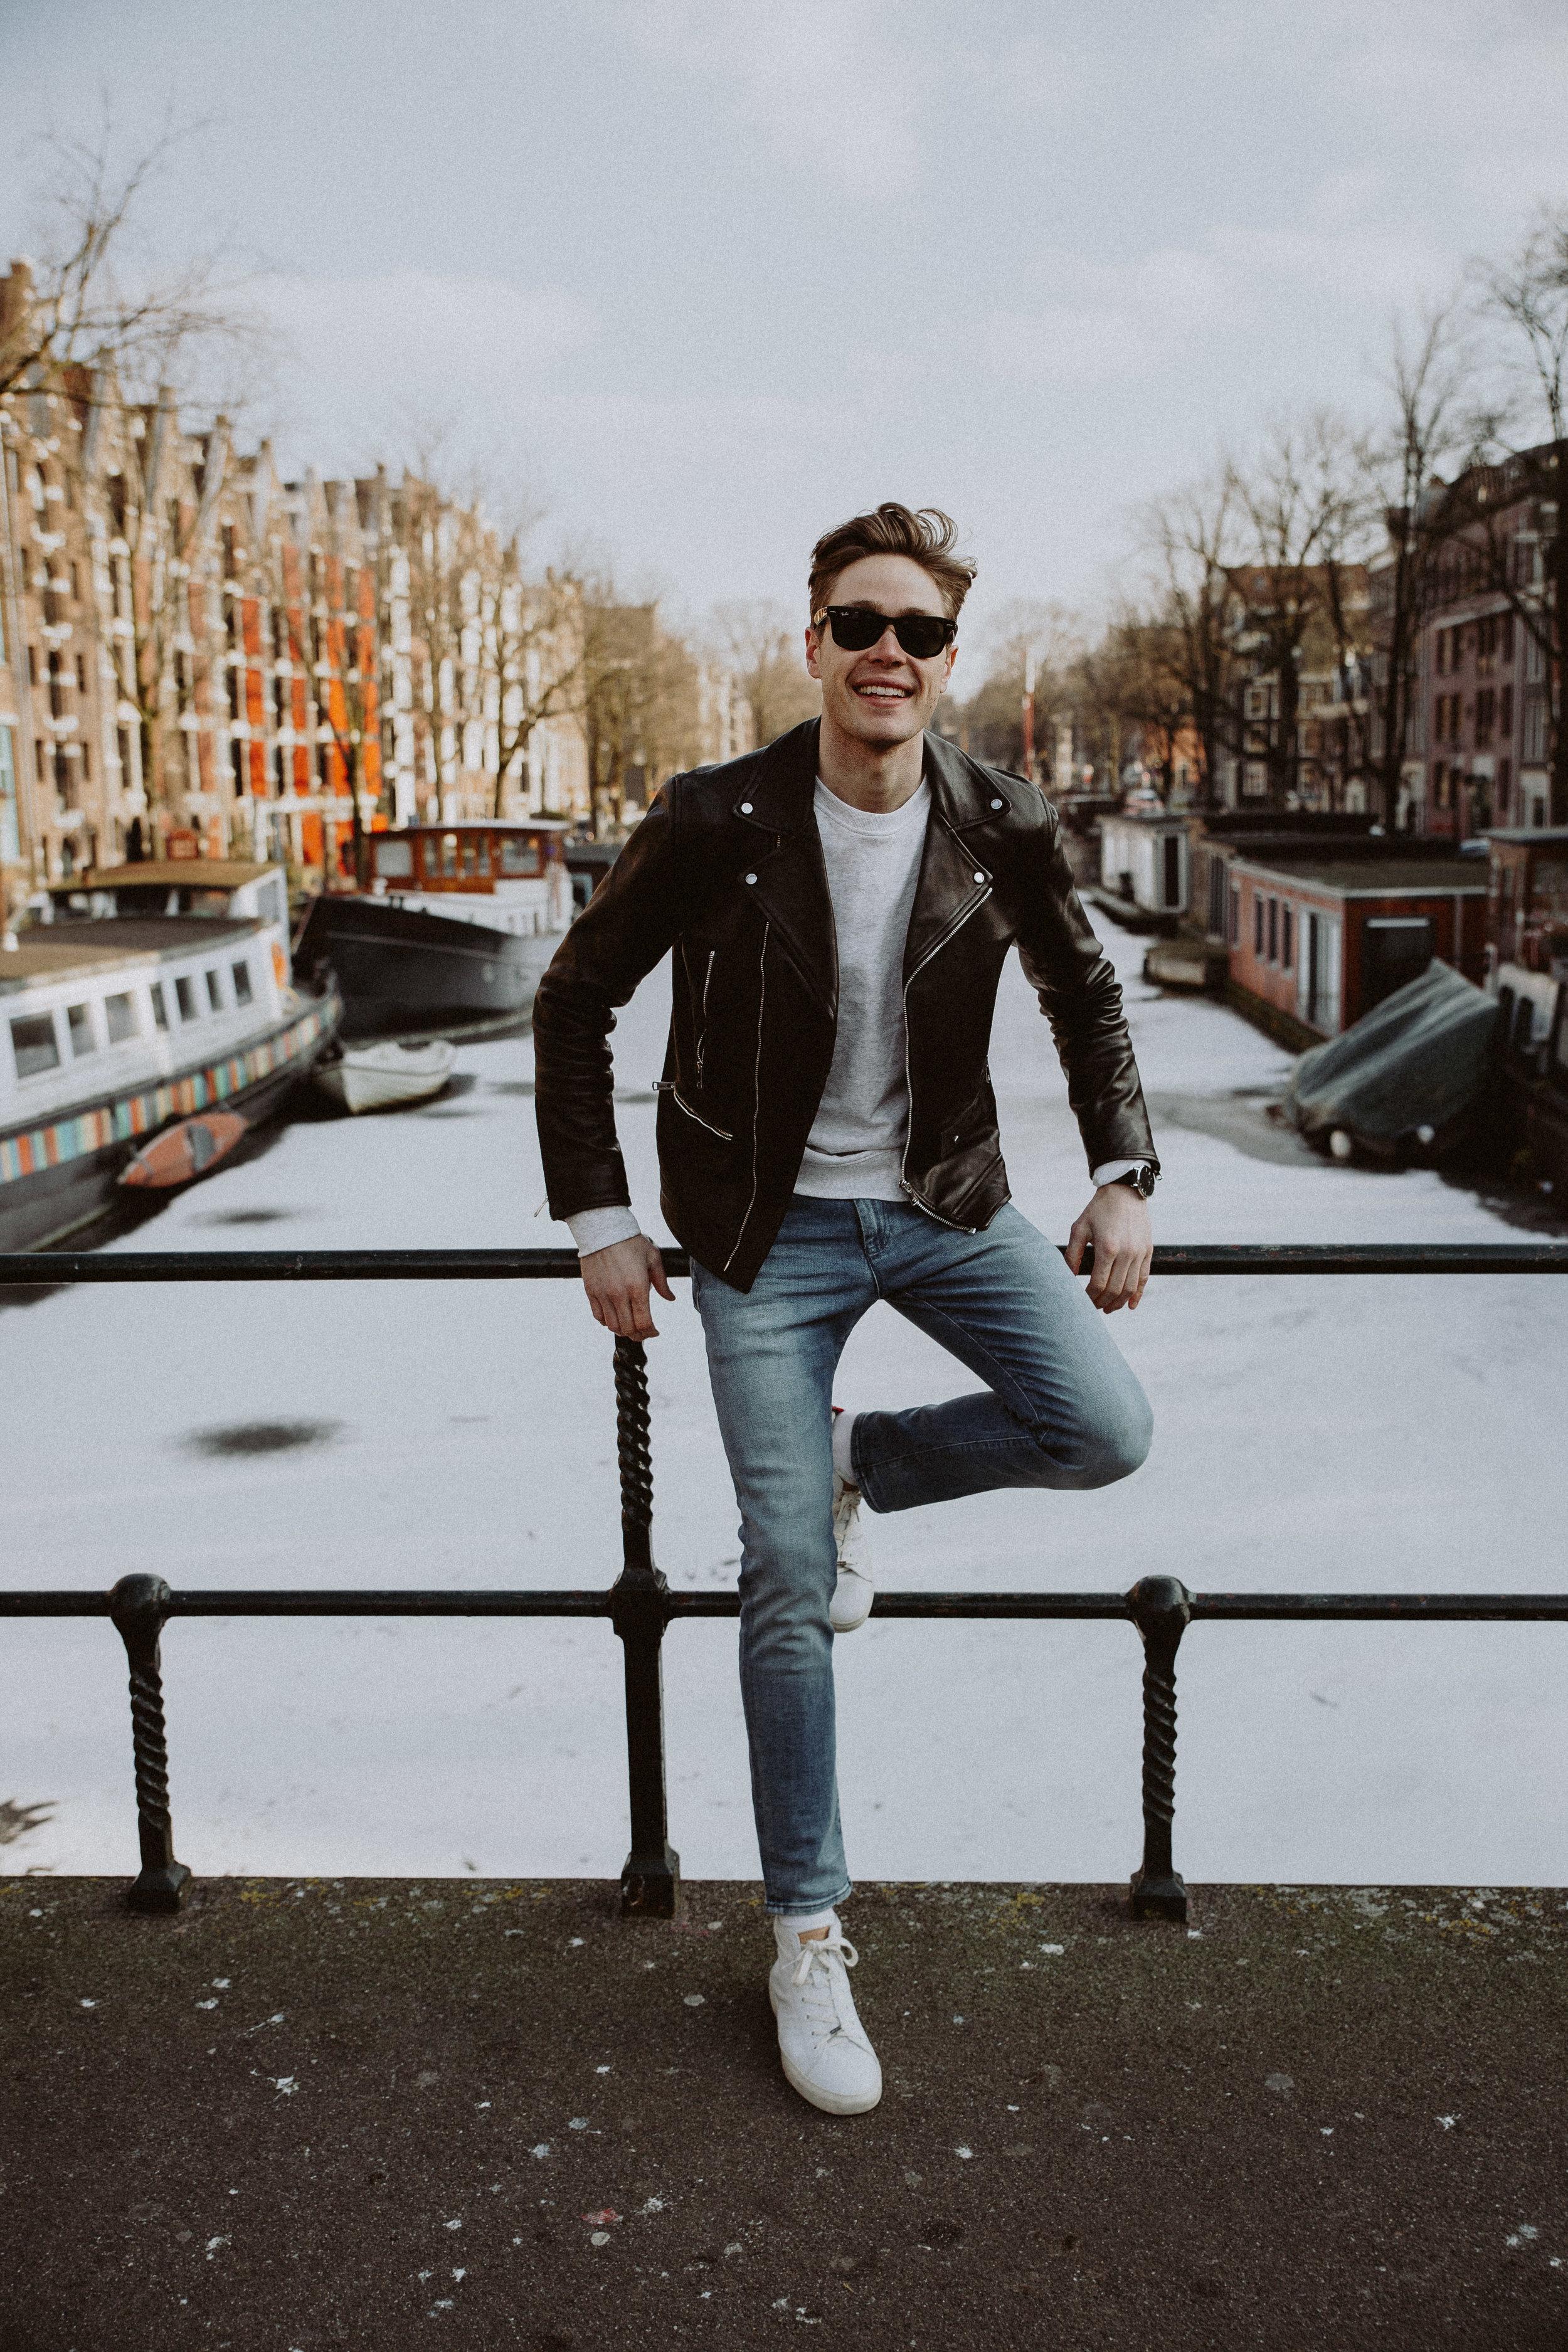 AmsterdamCity (14 of 34).jpg